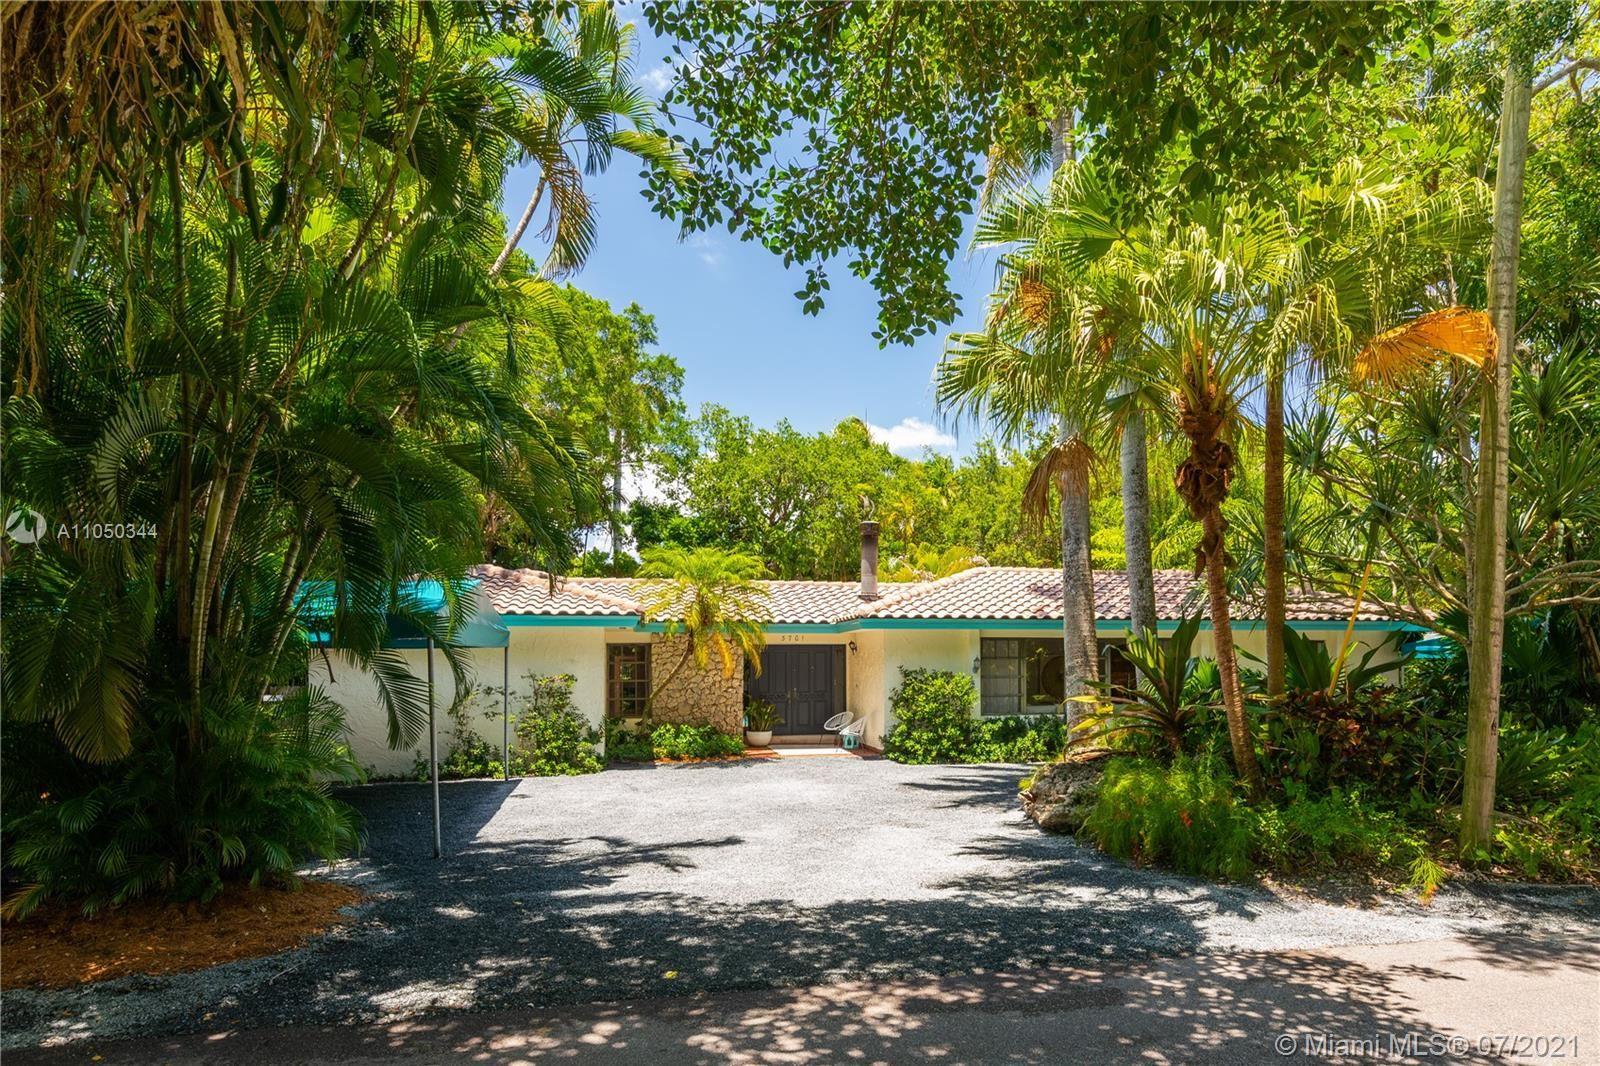 3701 Poinciana Ave, Coconut Grove, FL 33133 - #: A11050344